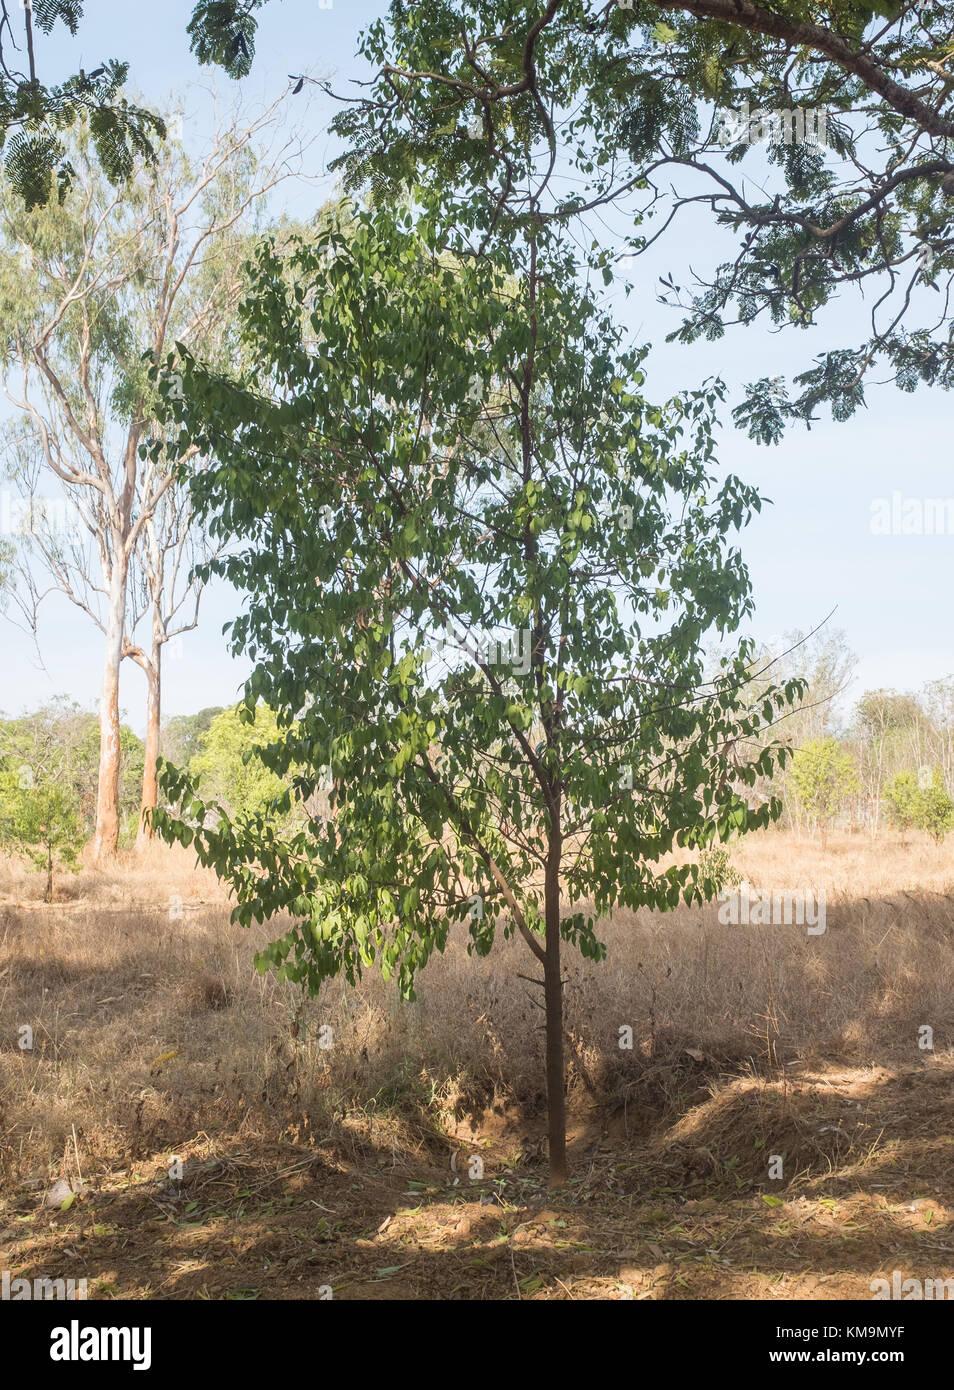 Young sandal (Santalum album) trees, Mysore, Karnataka, India. - Stock Image